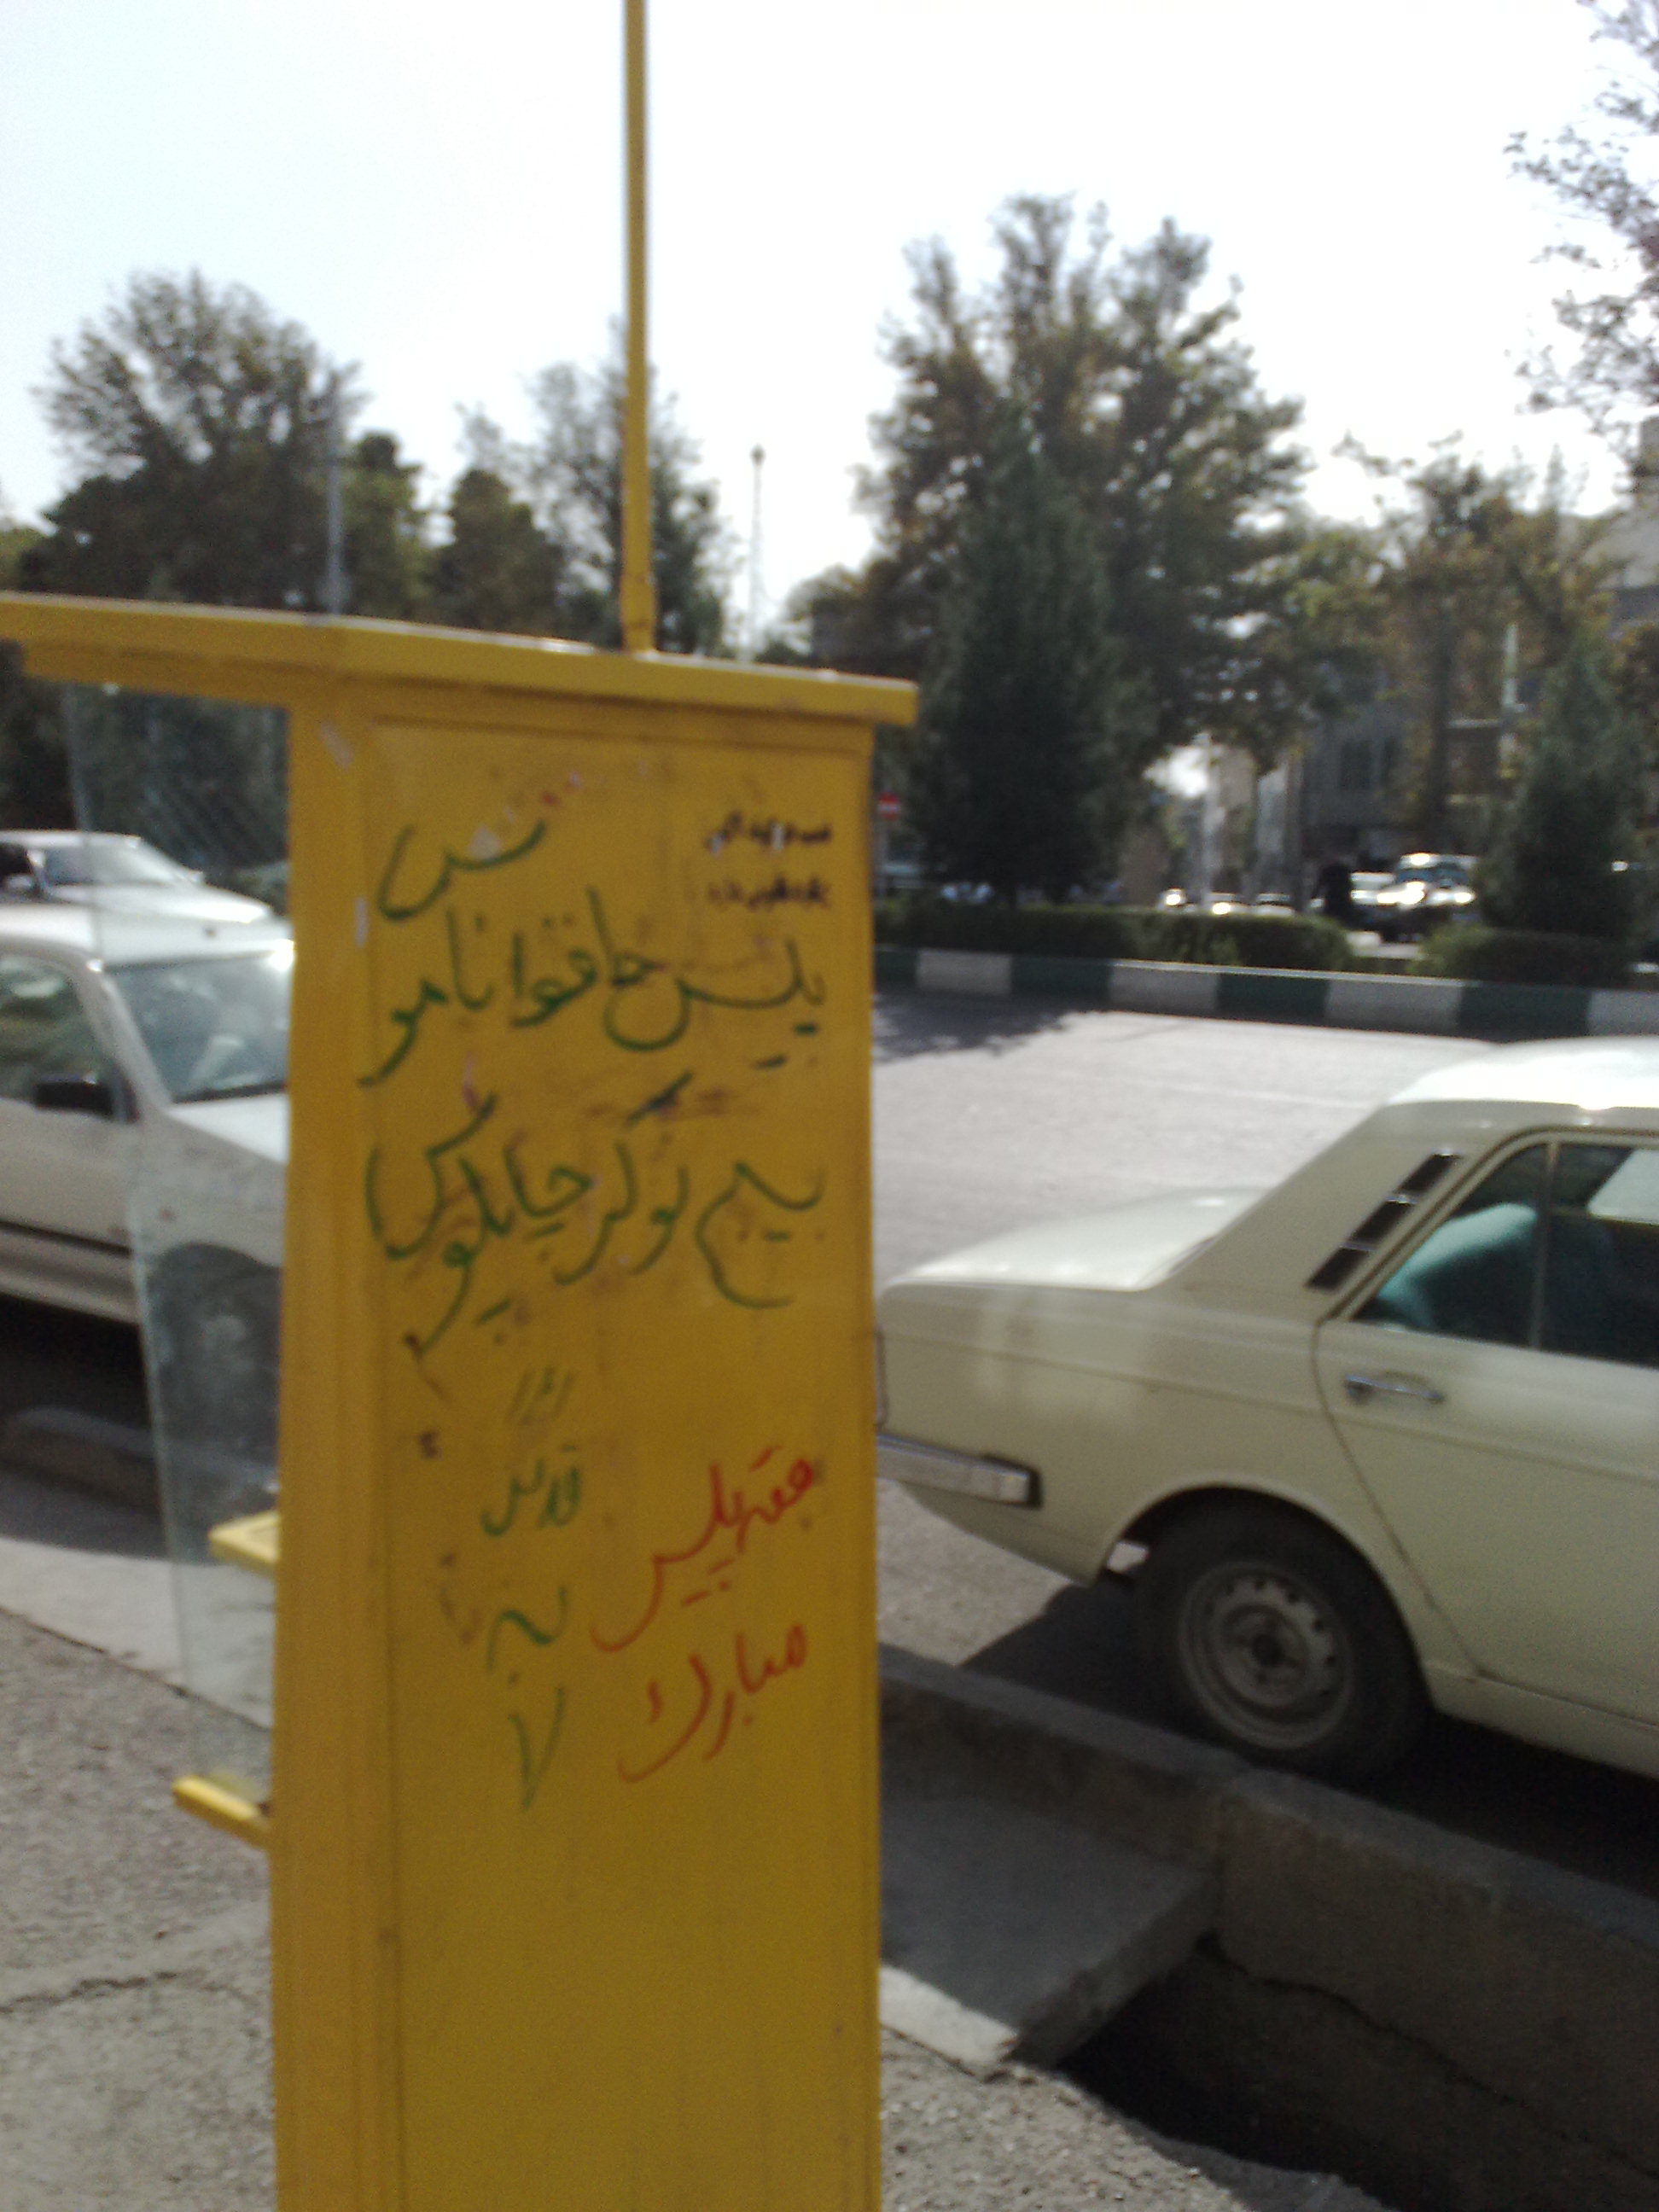 مهدی آژیر ویکی پدیا و به هگزیران مرکز پخش دوربین مدار